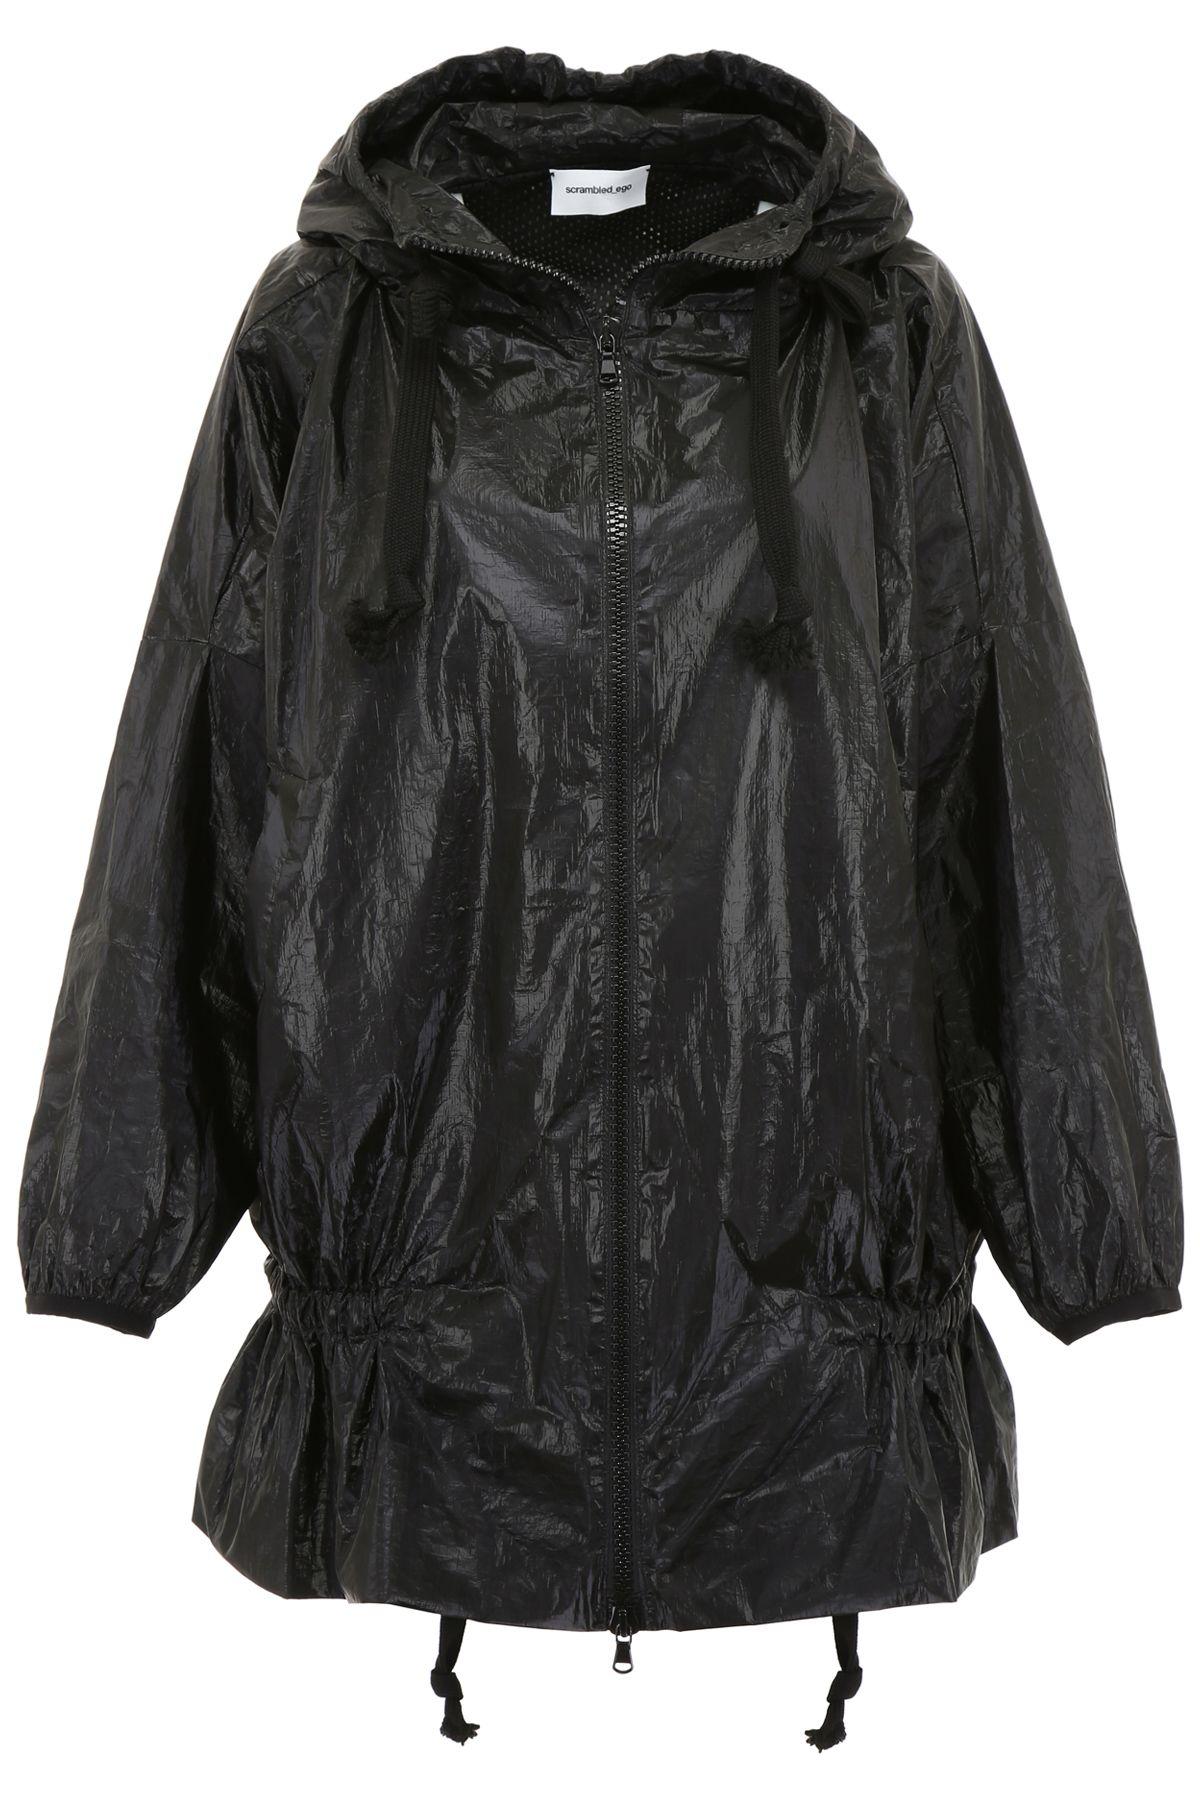 SCRAMBLED EGO Oversized Raincoat in Black